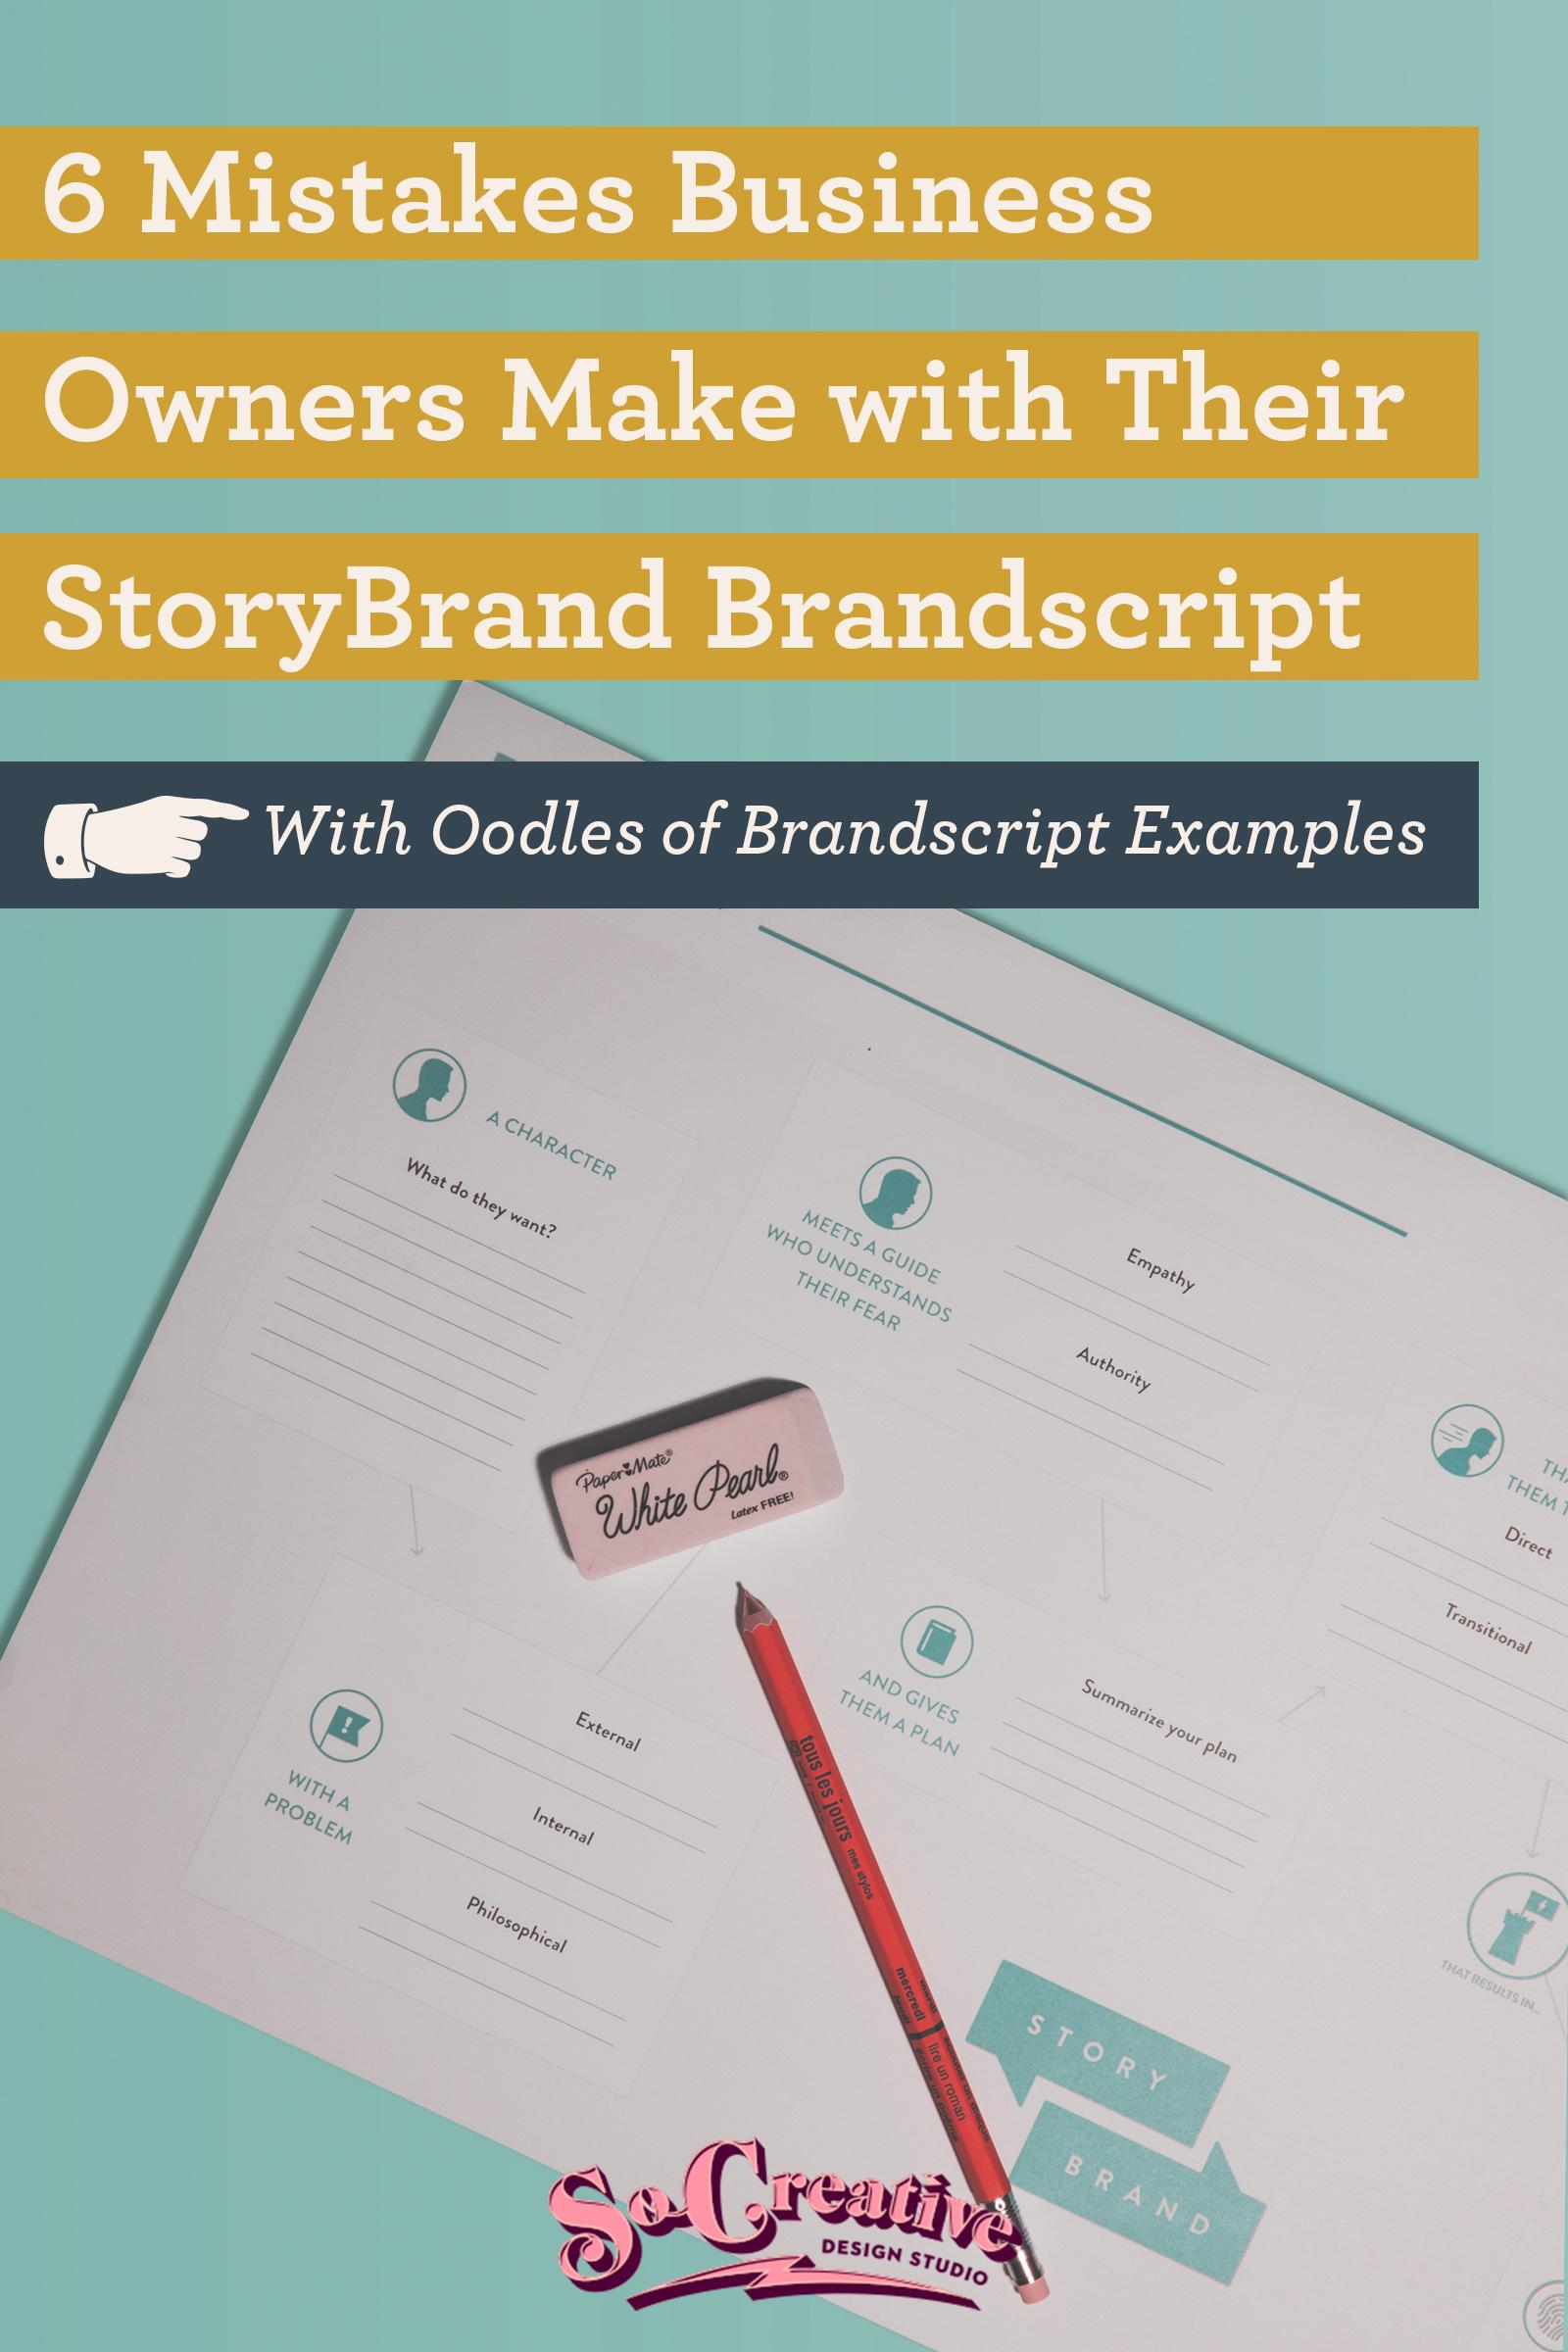 storybrand brandscript examples